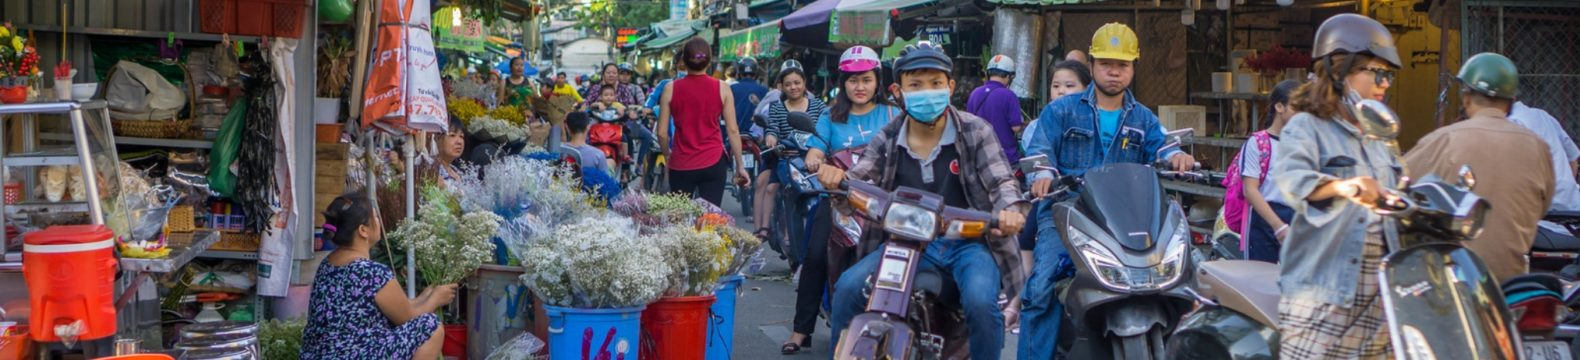 Hanoi Motorbike shop